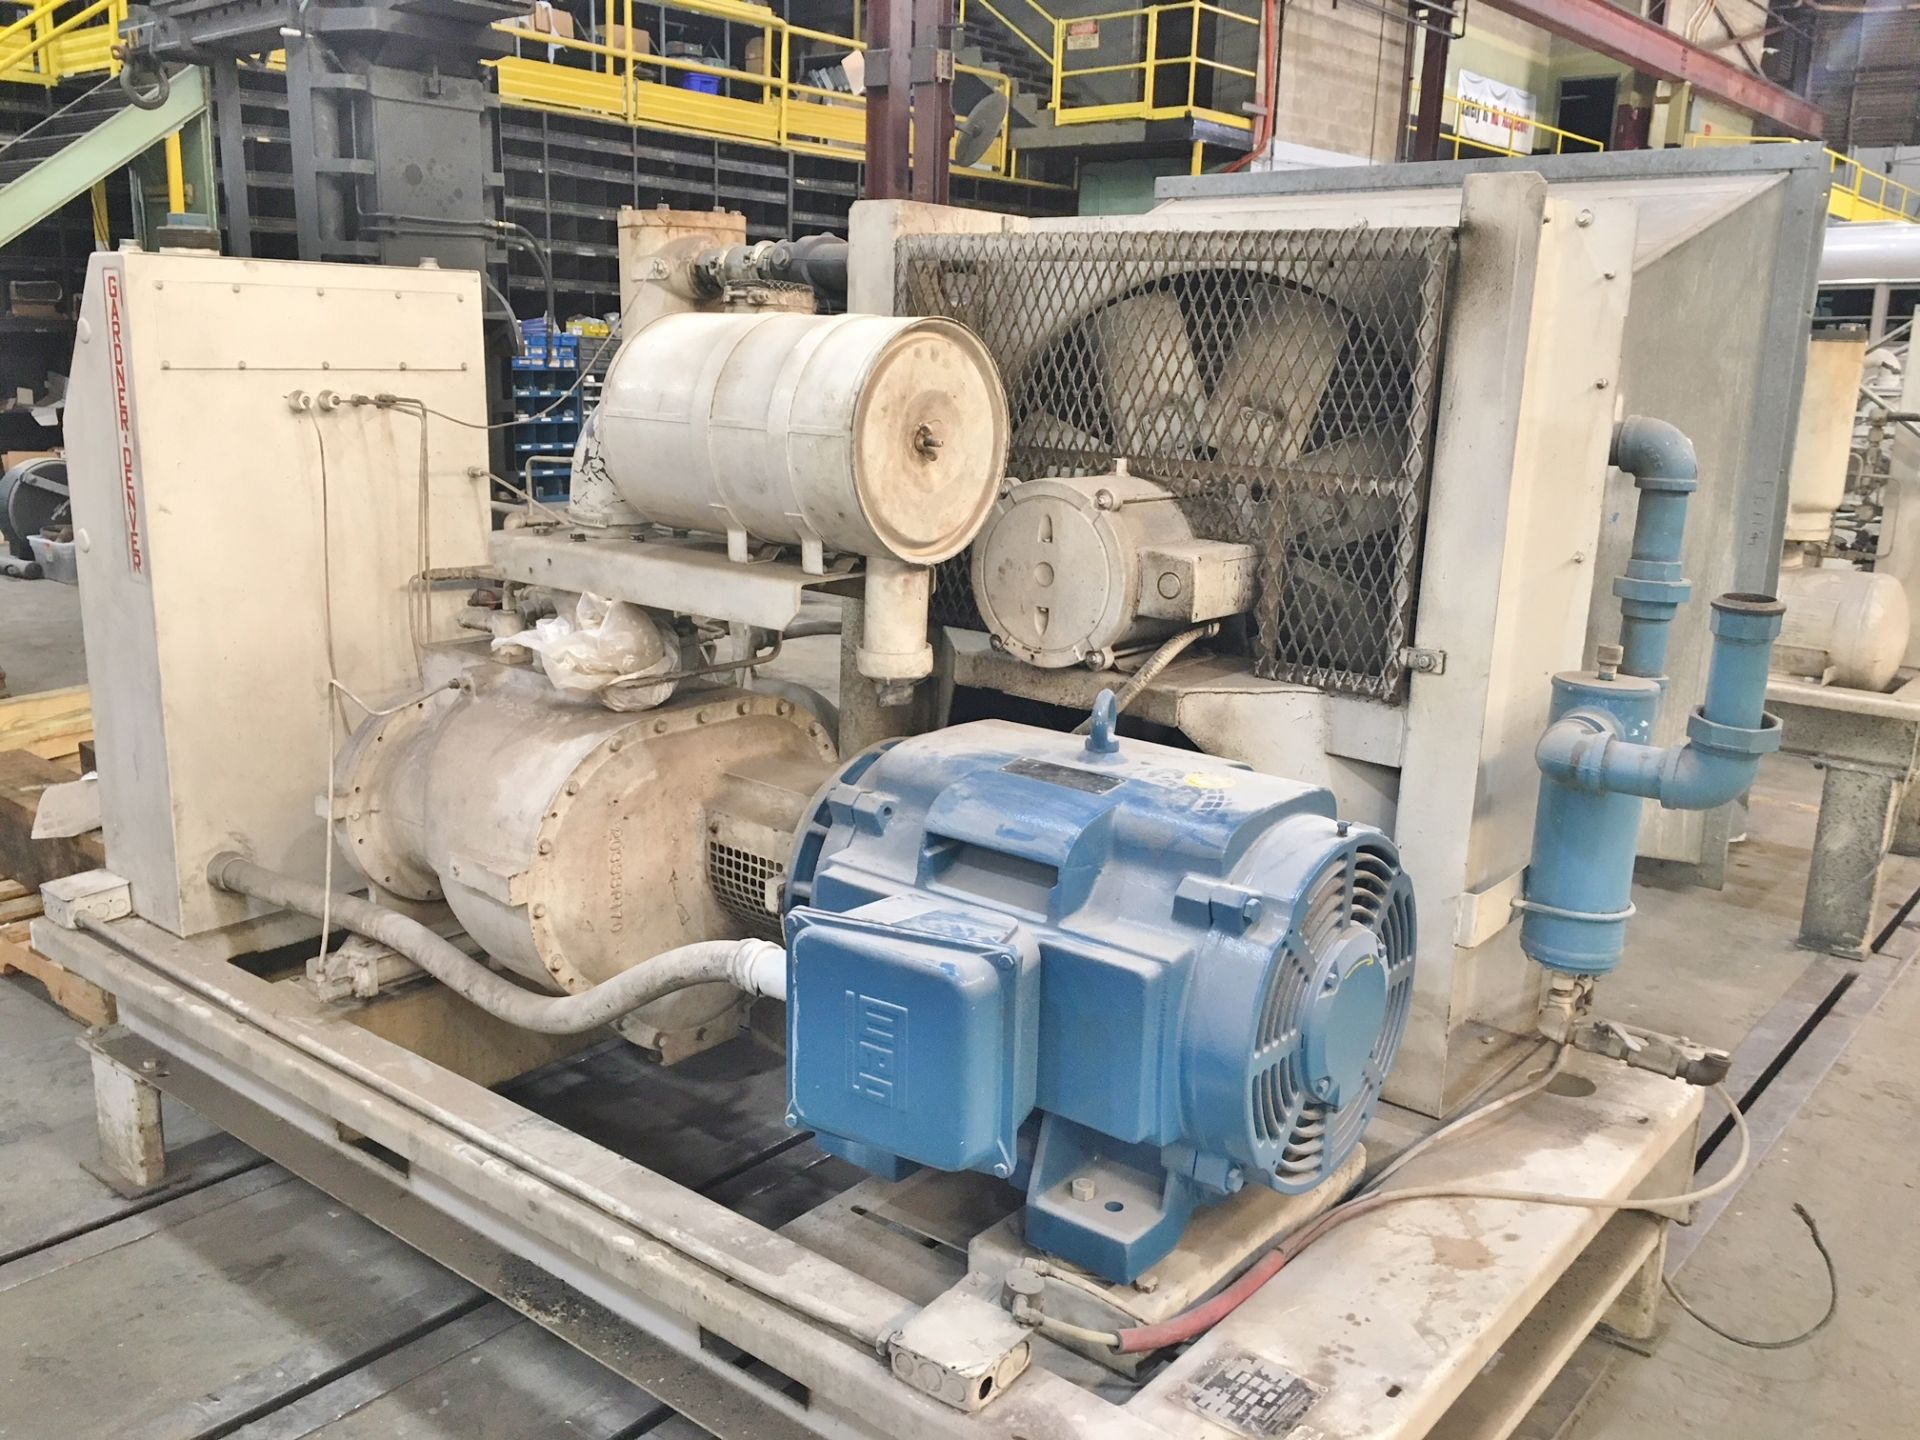 Lot 29 - Gardner Denver EAPQMC 100 HP Air Compressor